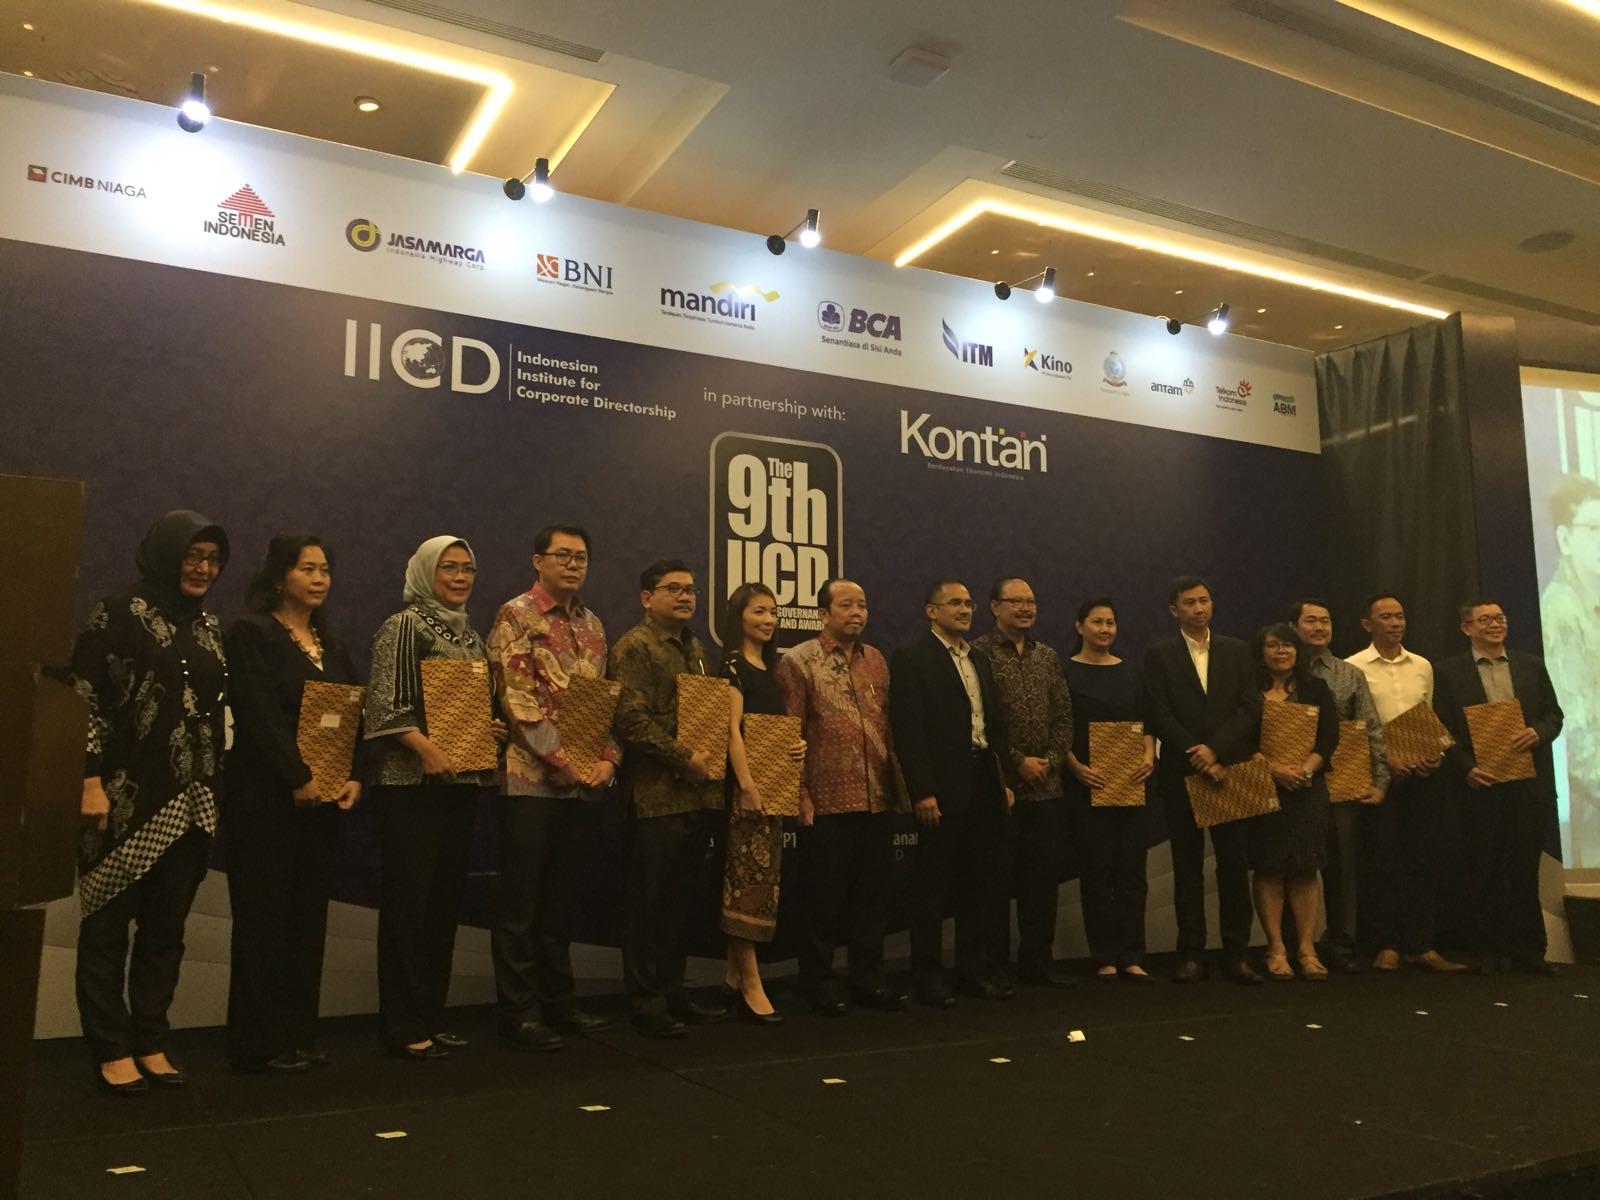 https: img.okeinfo.net content 2017 11 27 278 1821582 mnc-kapital-raih-2-penghargaan-dalam-acara-iicd-award-2017-xoEpkNwZWg.jpg